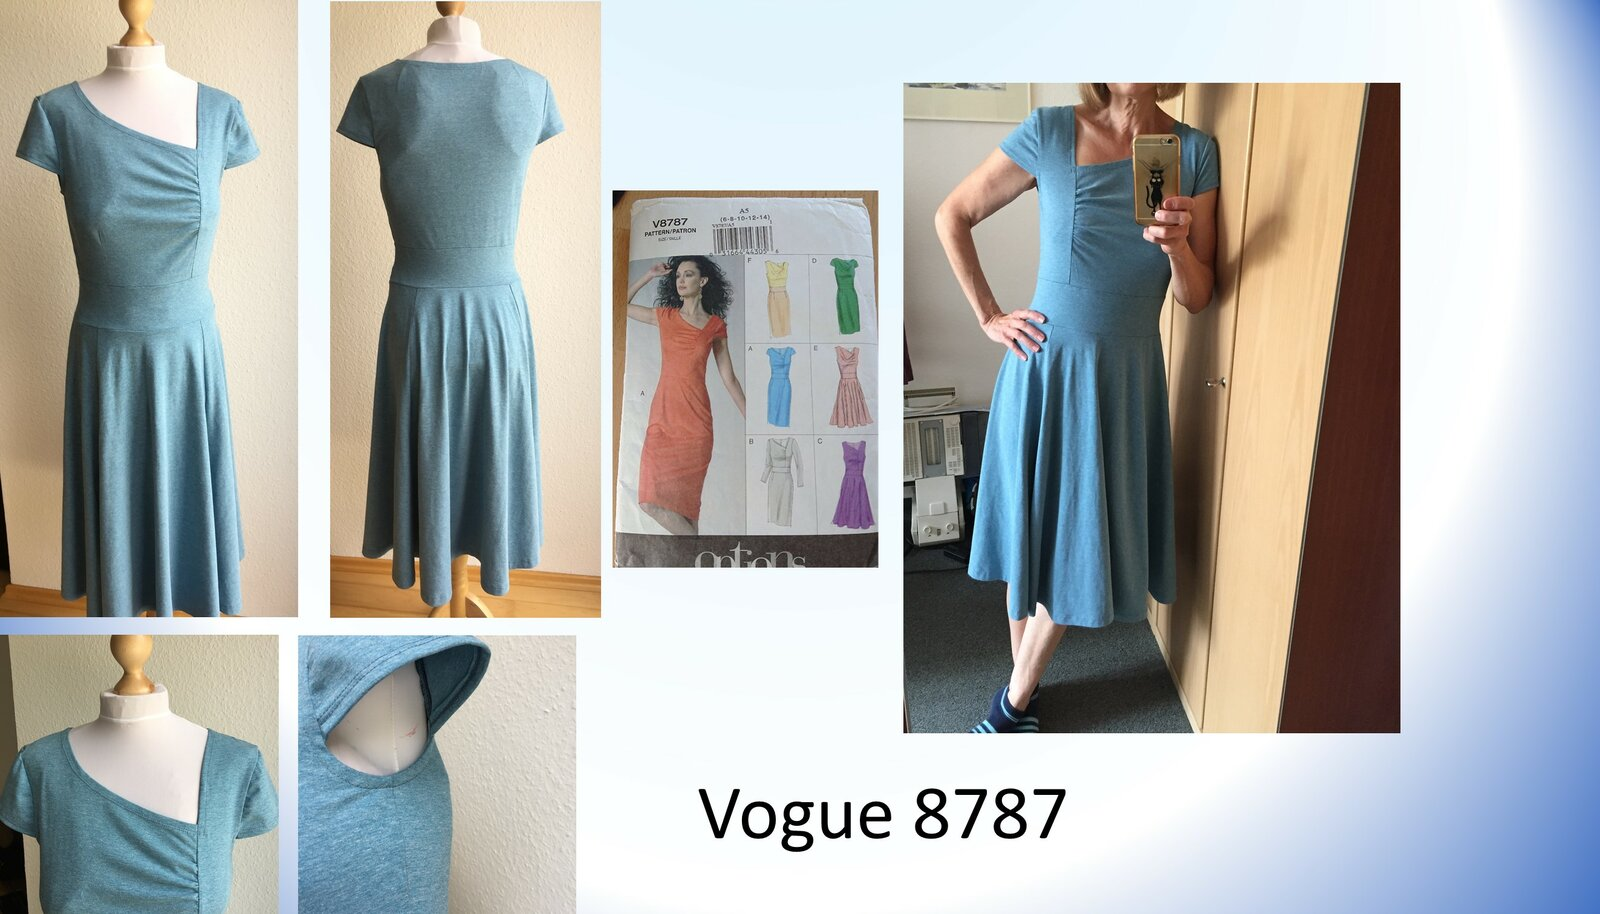 Vogue 8787